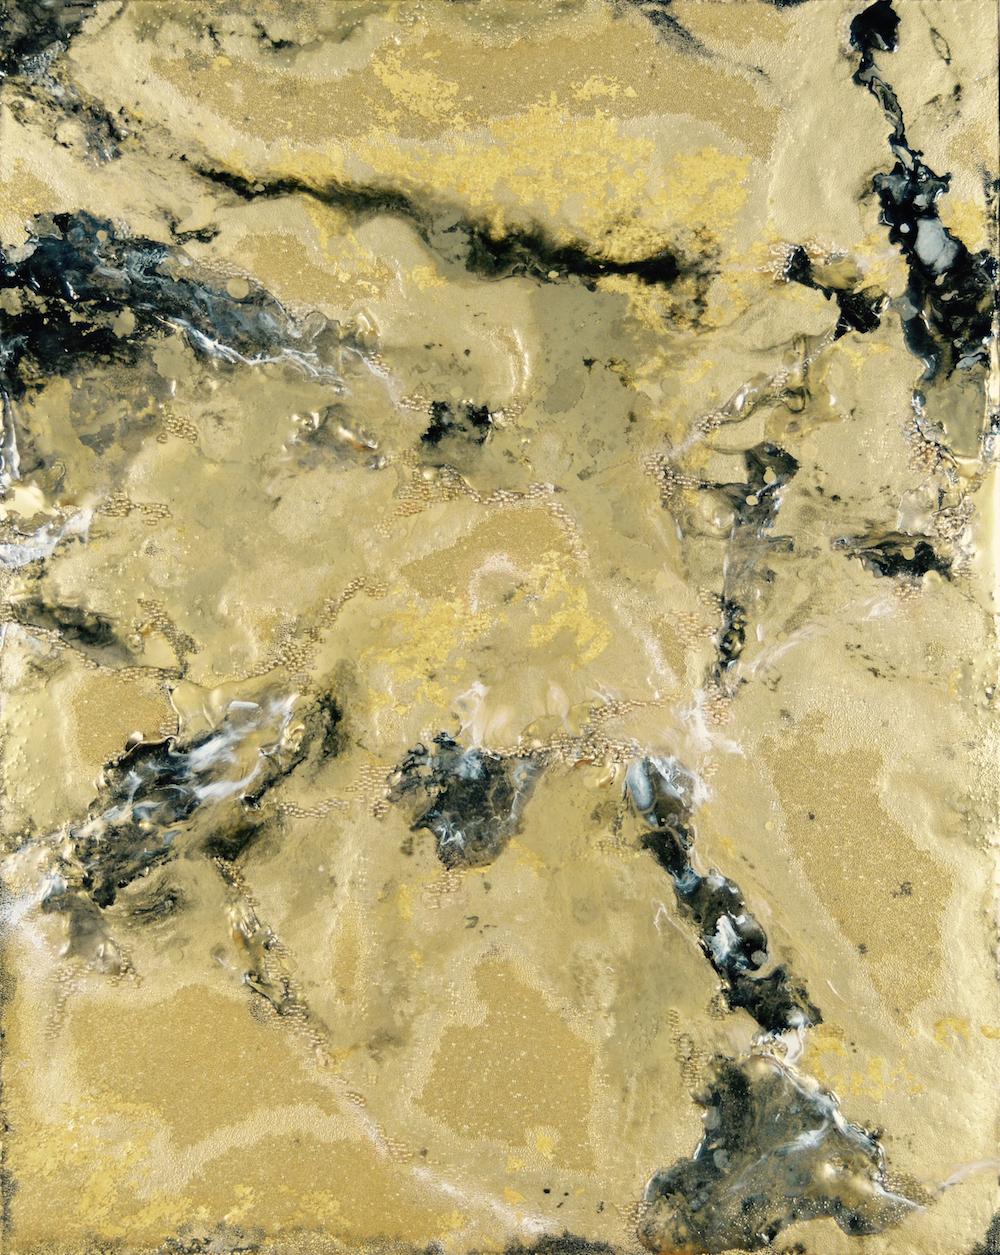 SARAH RASKEY - WHERE CRYSTAL DROPS FALL SLOWLY FROM A THOUSAND TINY EDGES - 29.75X23.5